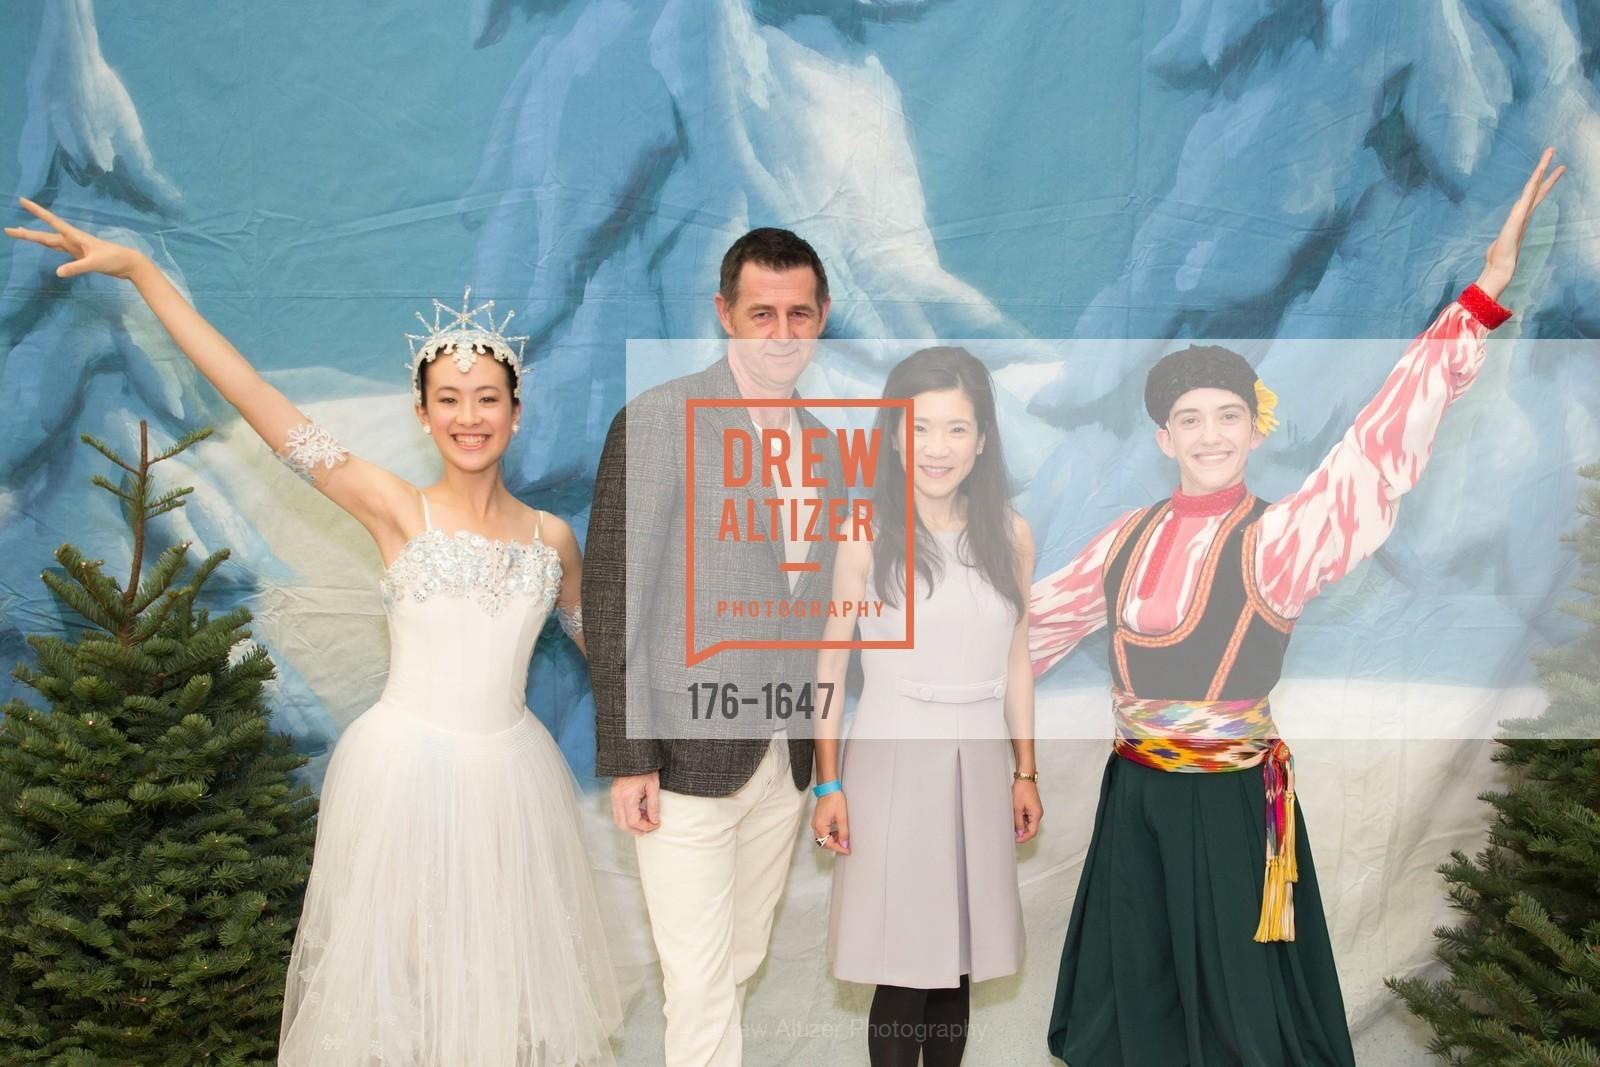 Jeffrey Weber, Priscilla Weber, SF Ballet's Nutcracker Luncheon, City Hall & War Memorial Opera House. 301 Van Ness Ave, San Francisco, CA 94109, December 11th, 2016